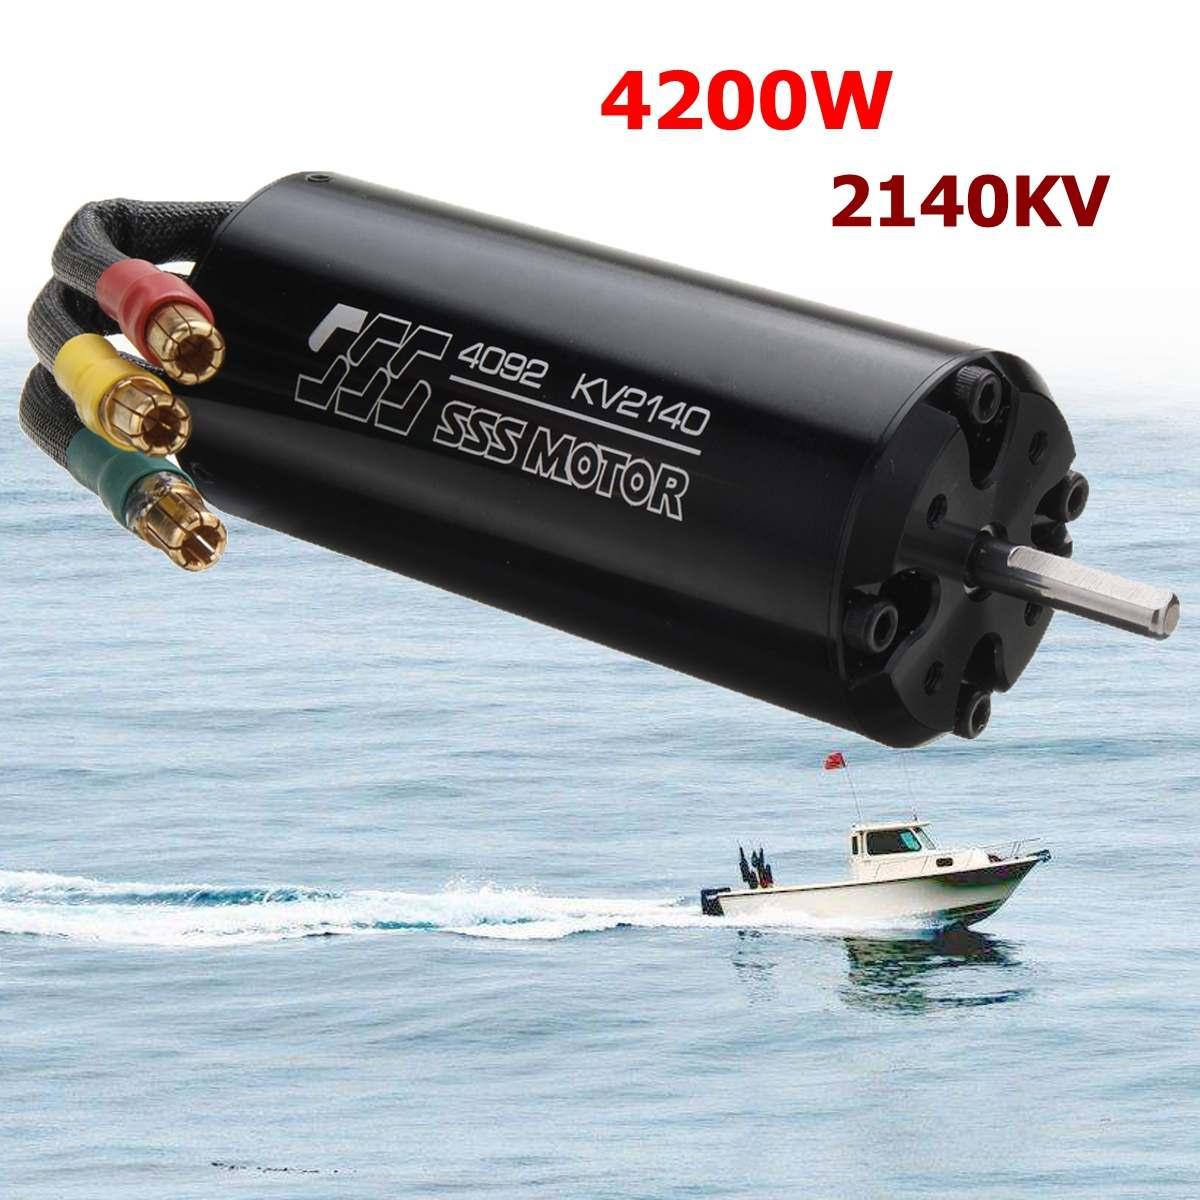 SSS 4092/2140KV Brushless Motor 4 Poles W/O Water Cooling For RC BoatsSSS 4092/2140KV Brushless Motor 4 Poles W/O Water Cooling For RC Boats